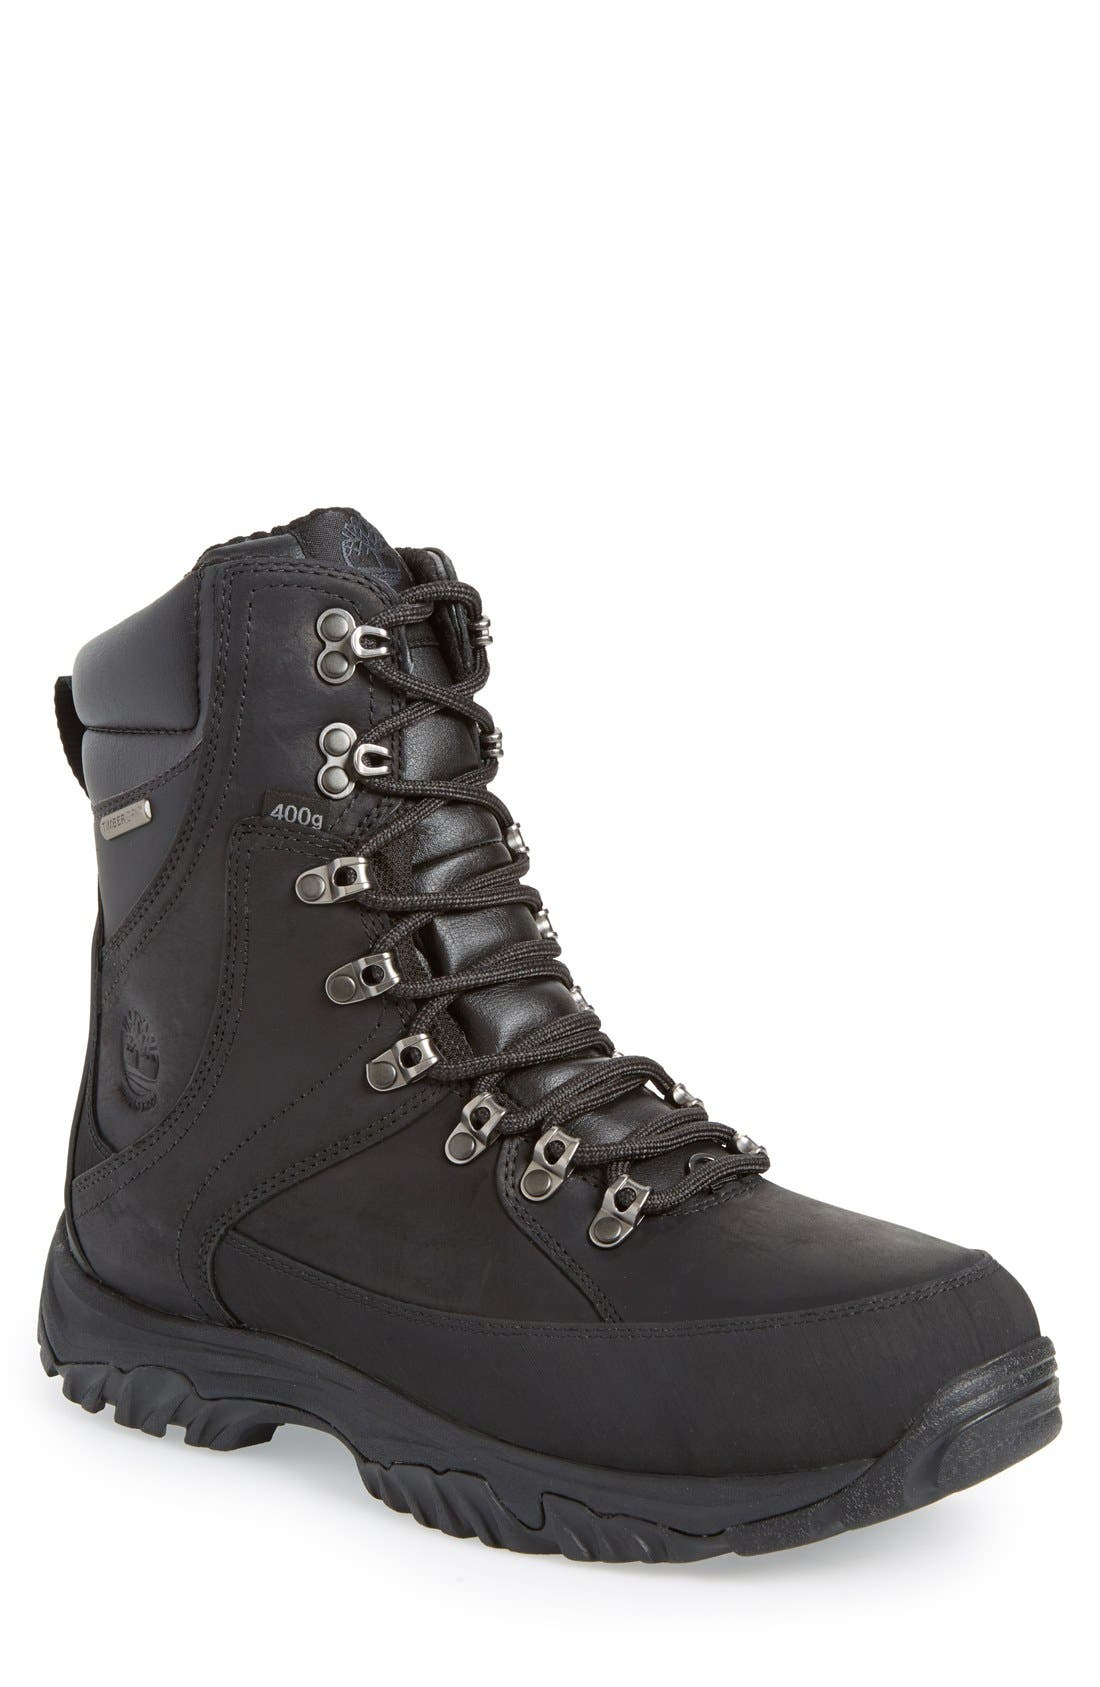 Main Image - Timberland 'Thorton' Waterproof Hiking Boot (Men)